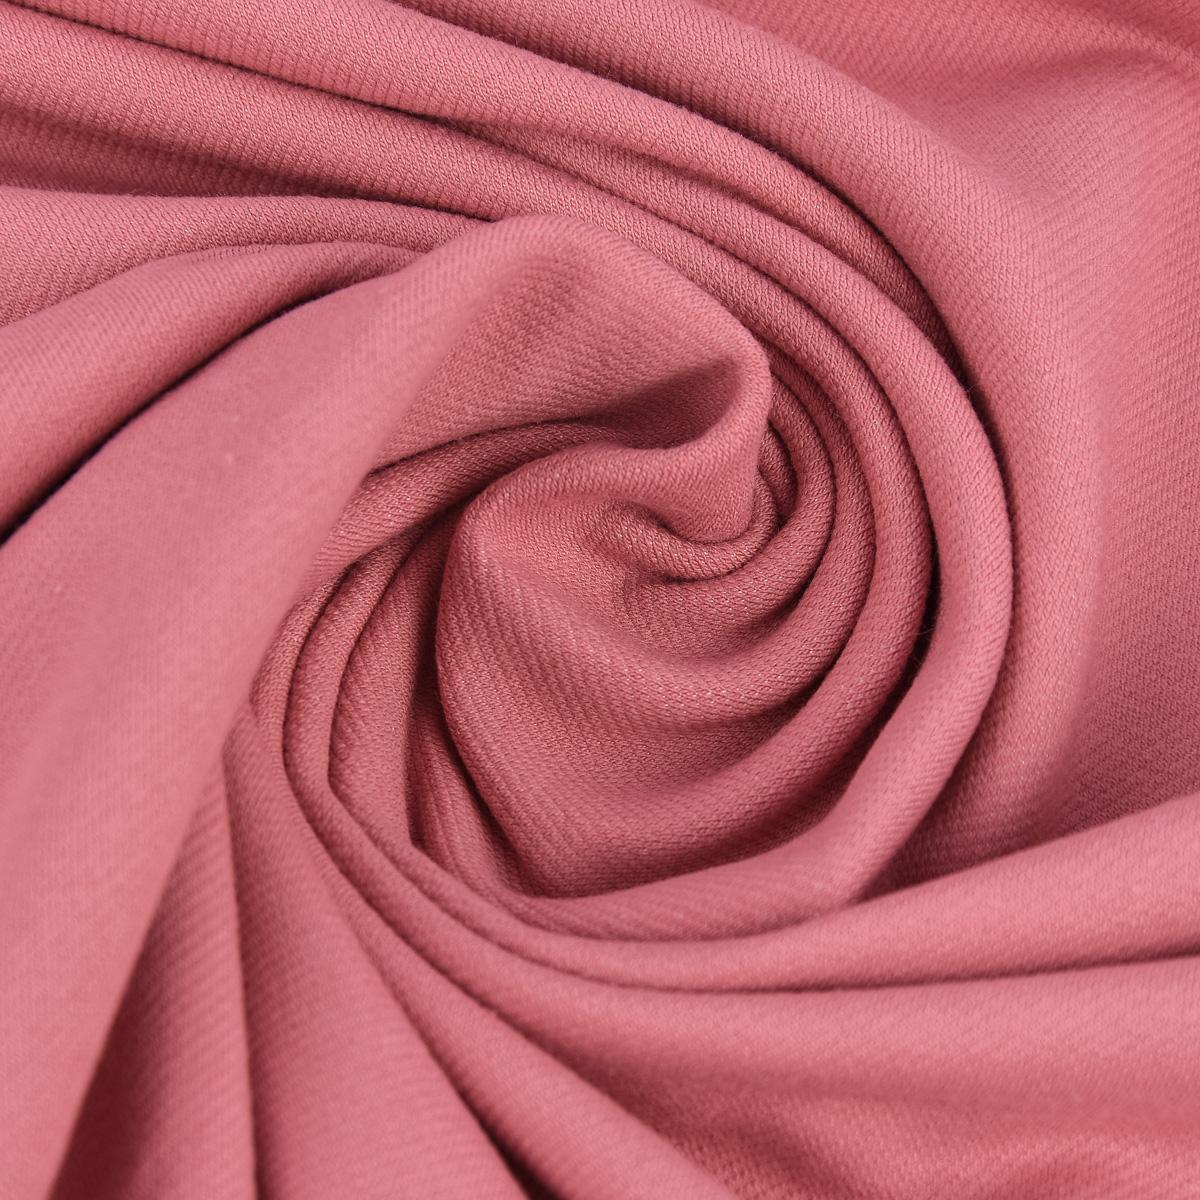 baumwoll jeansstoff mit elasthan stretchjeans stoff weich einfarbig rosa 1 5m breite alle stoffe. Black Bedroom Furniture Sets. Home Design Ideas